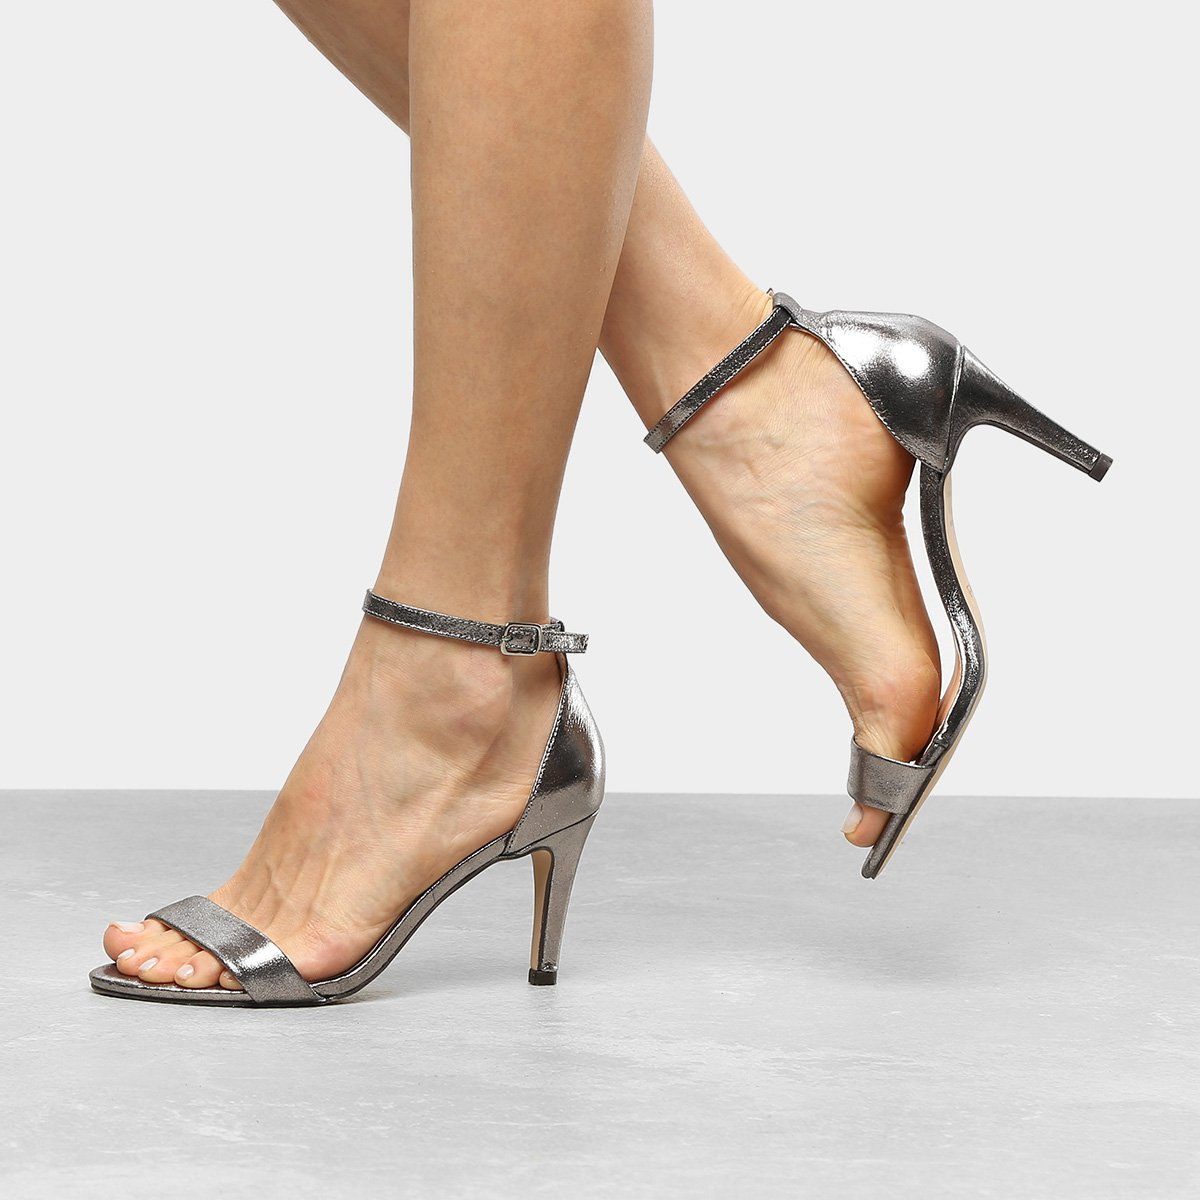 Sandália Couro Shoestock Salto Fino Feminina - Chumbo